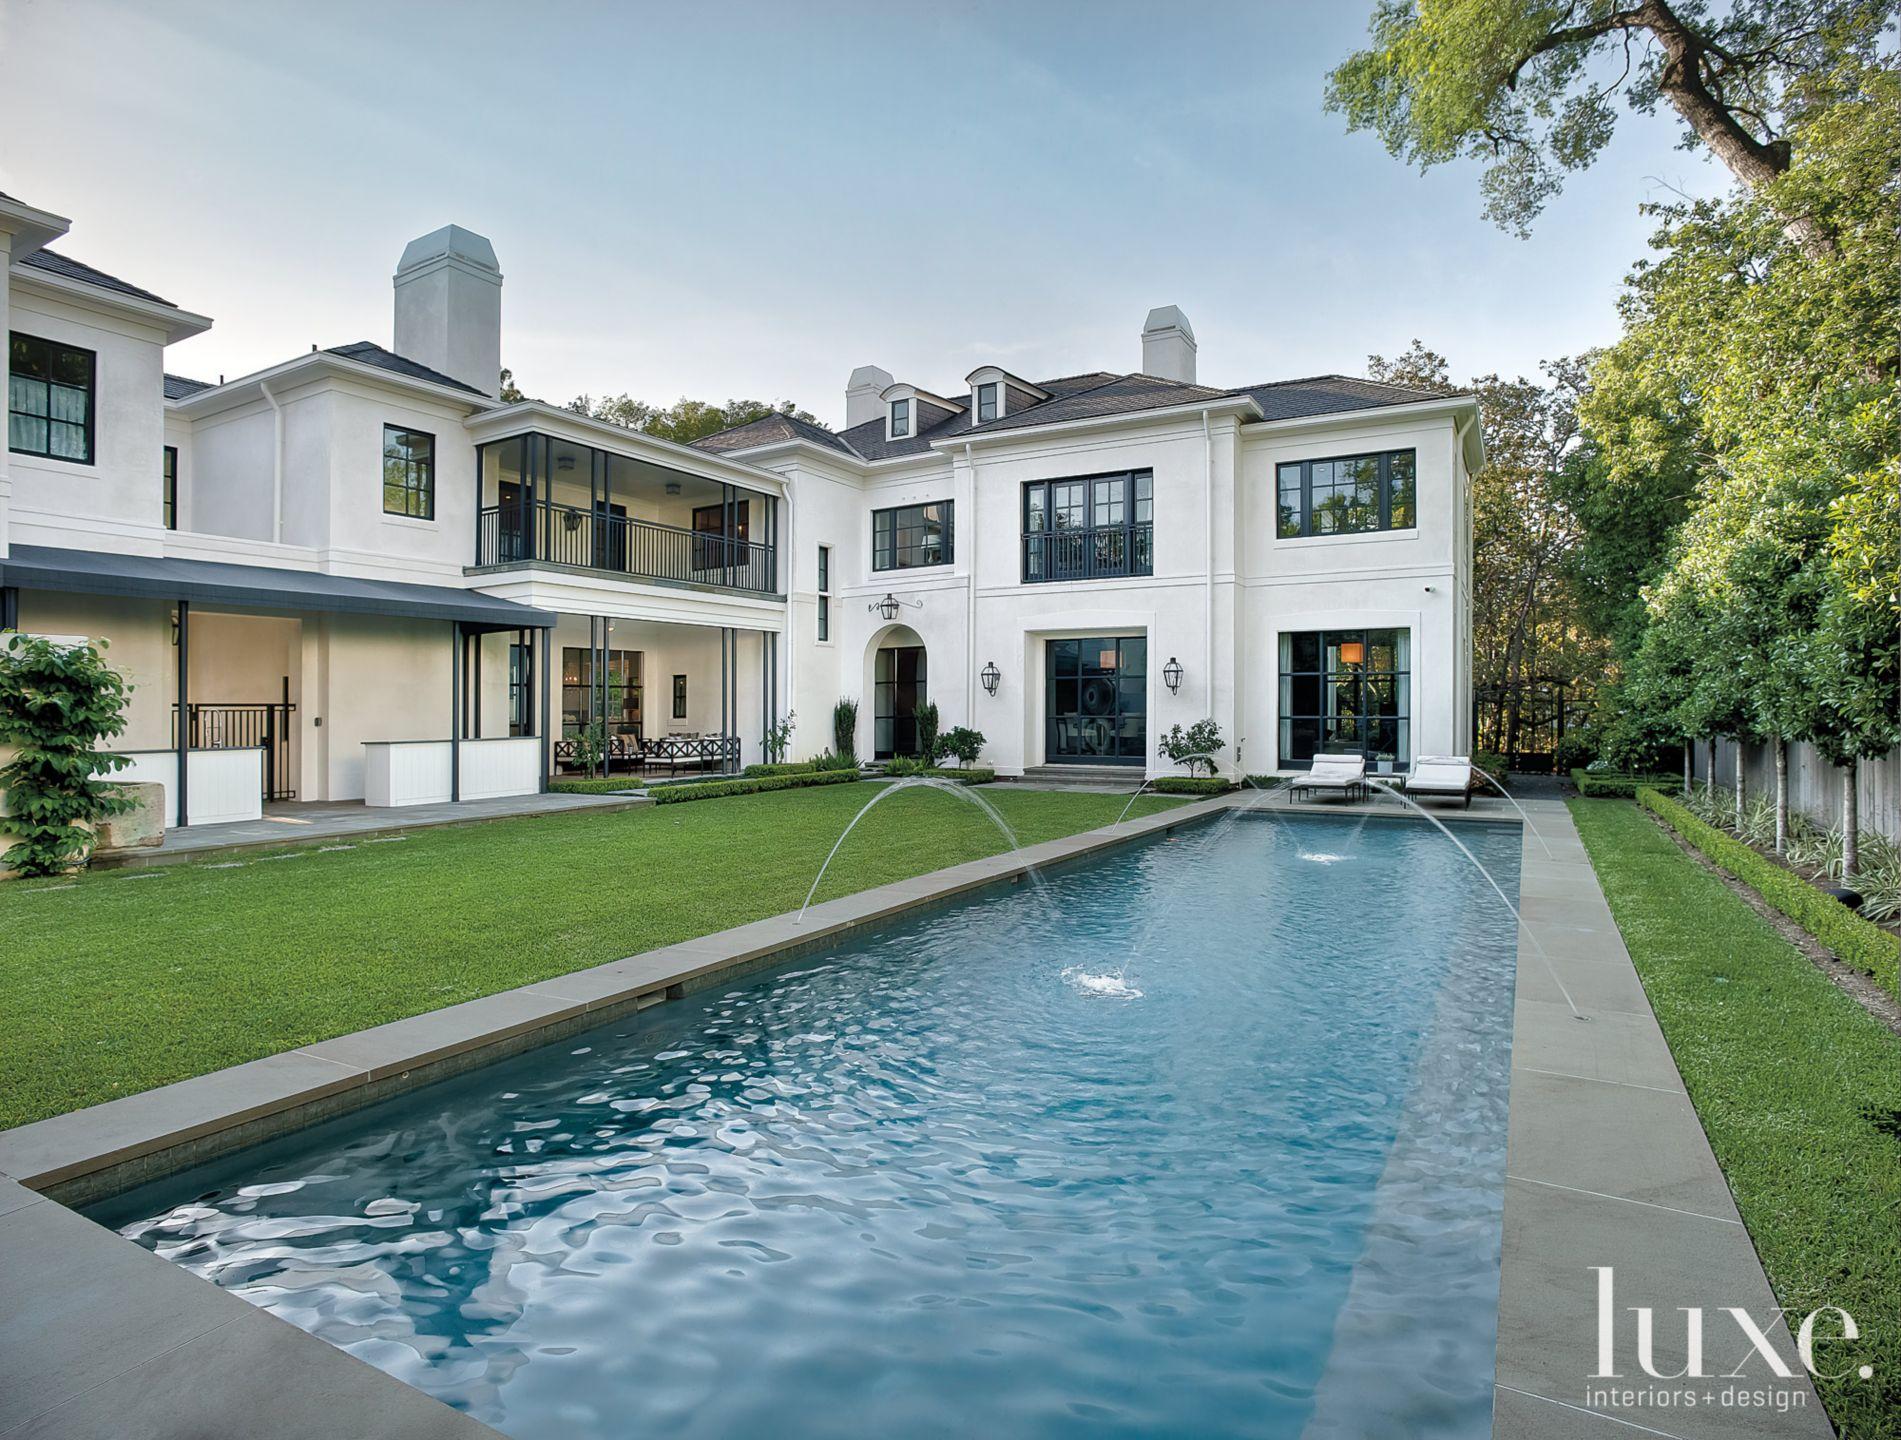 Classic Regency-Style Backyard with Pool